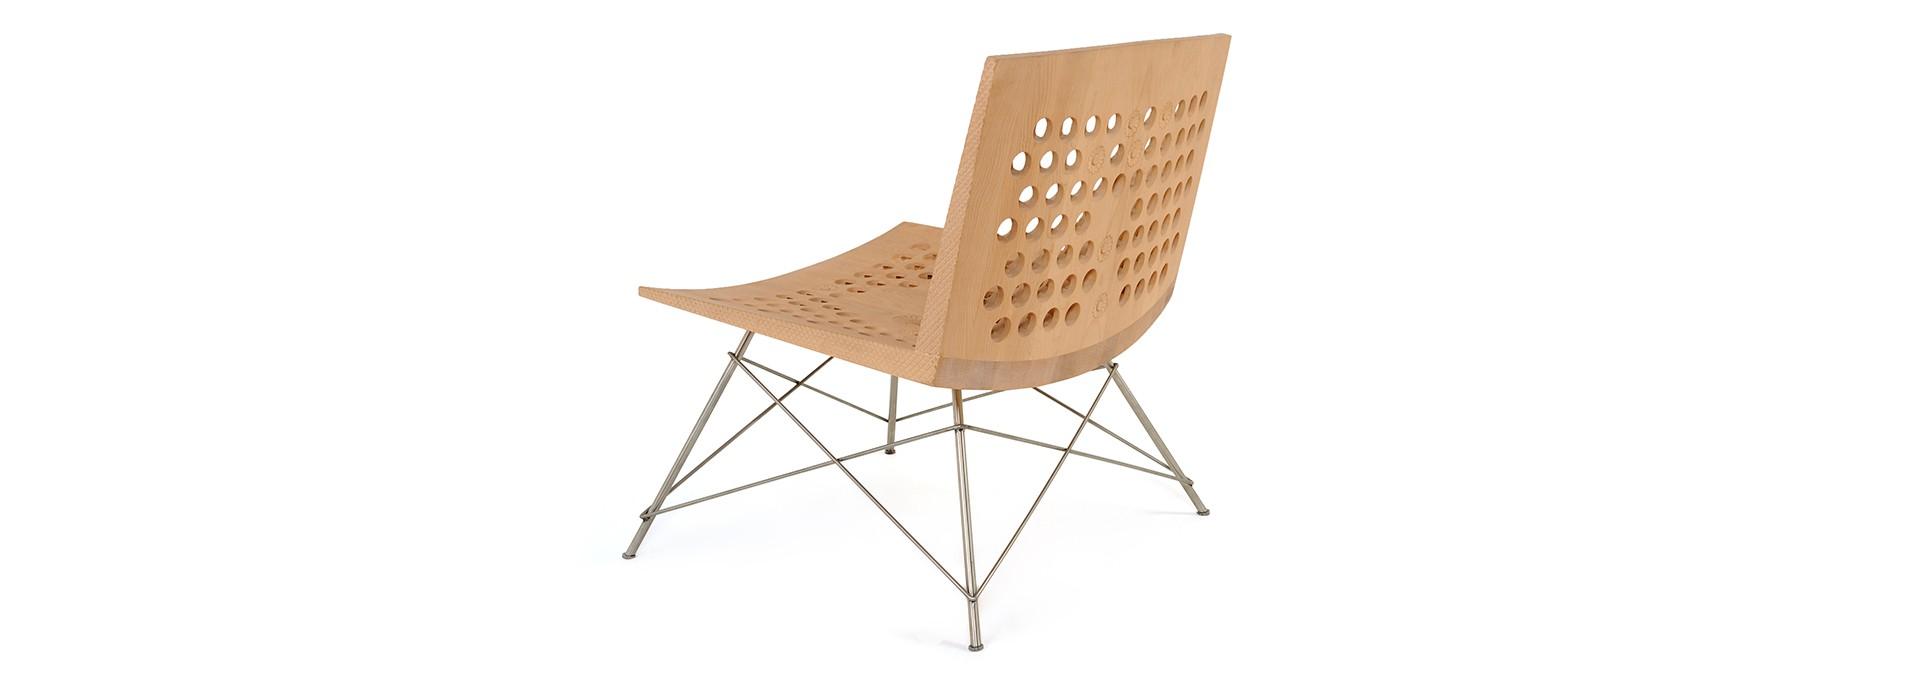 Wave Lounge Chair By Salih Teskeredžić For Zanat Sohomod